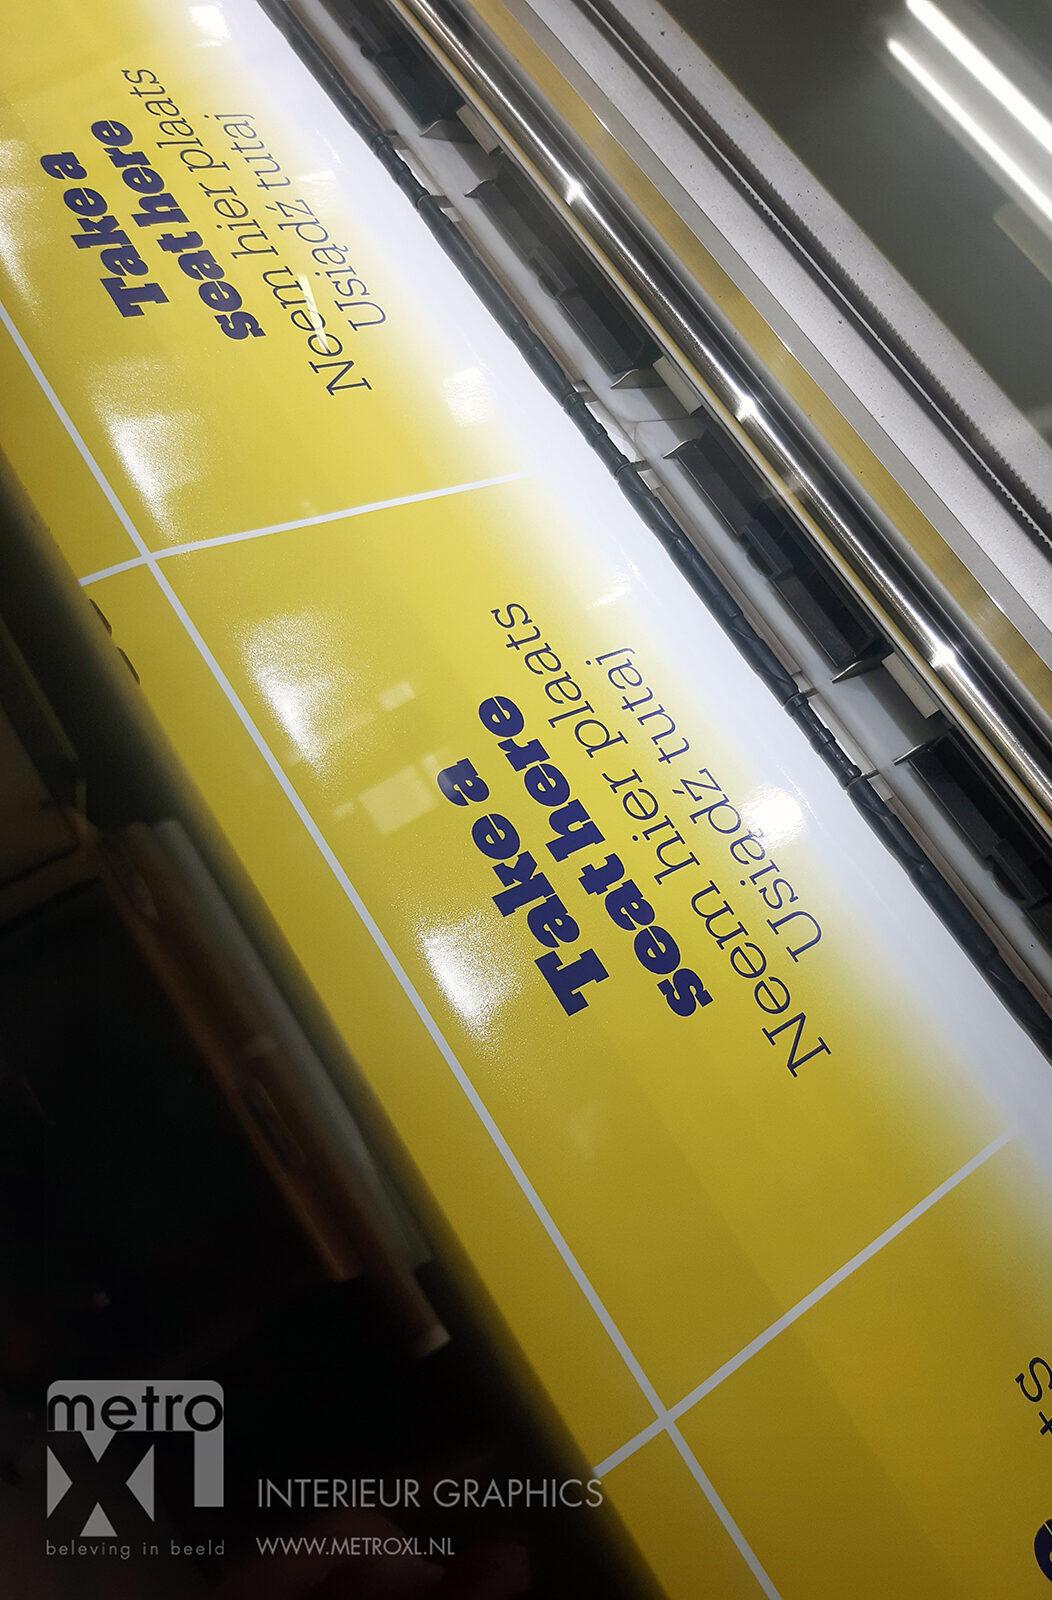 corona signing bol.com printer metroxl